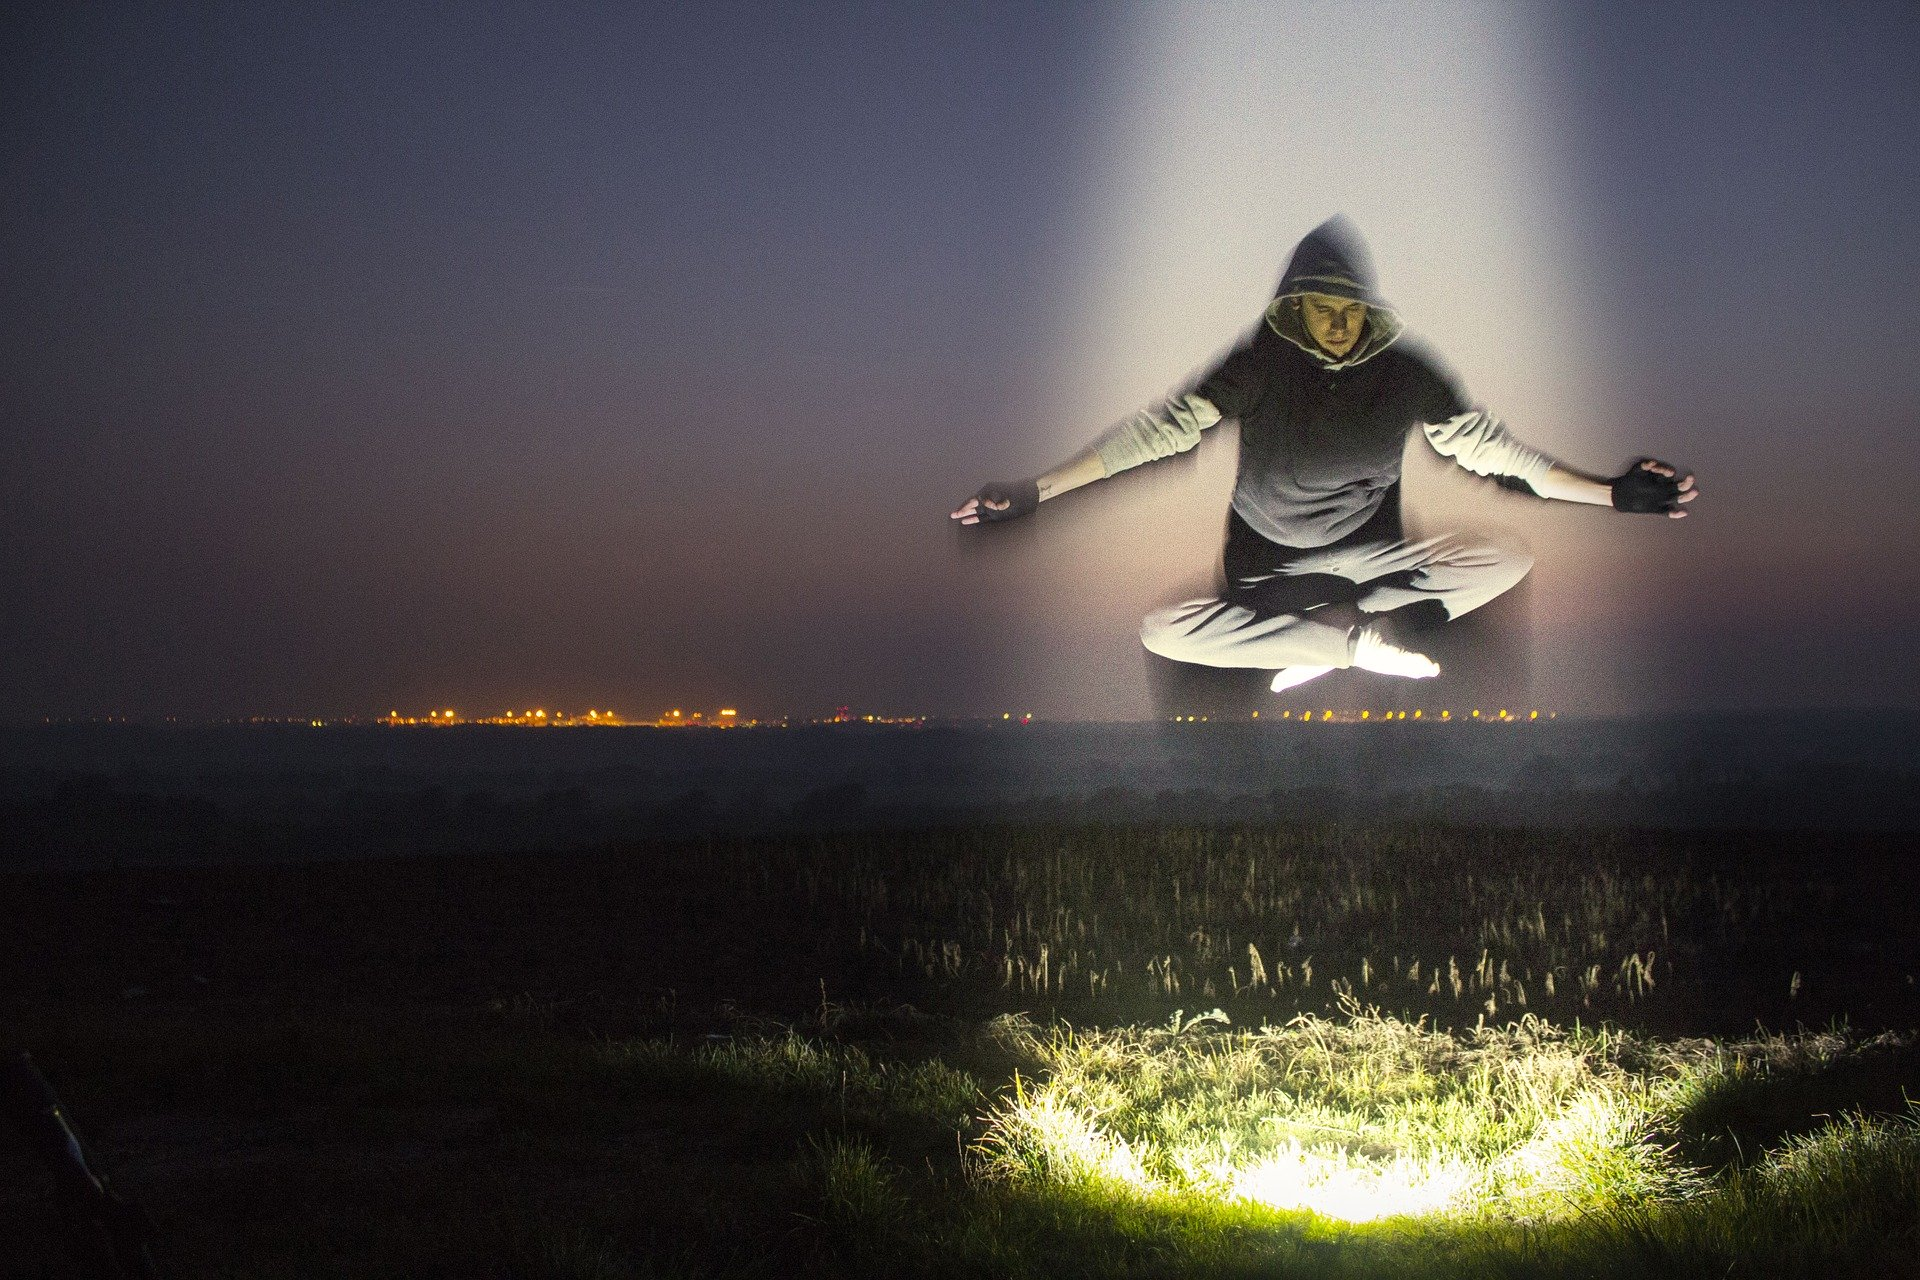 meditation-levitation - Image by Benjamin Balazs from Pixabay